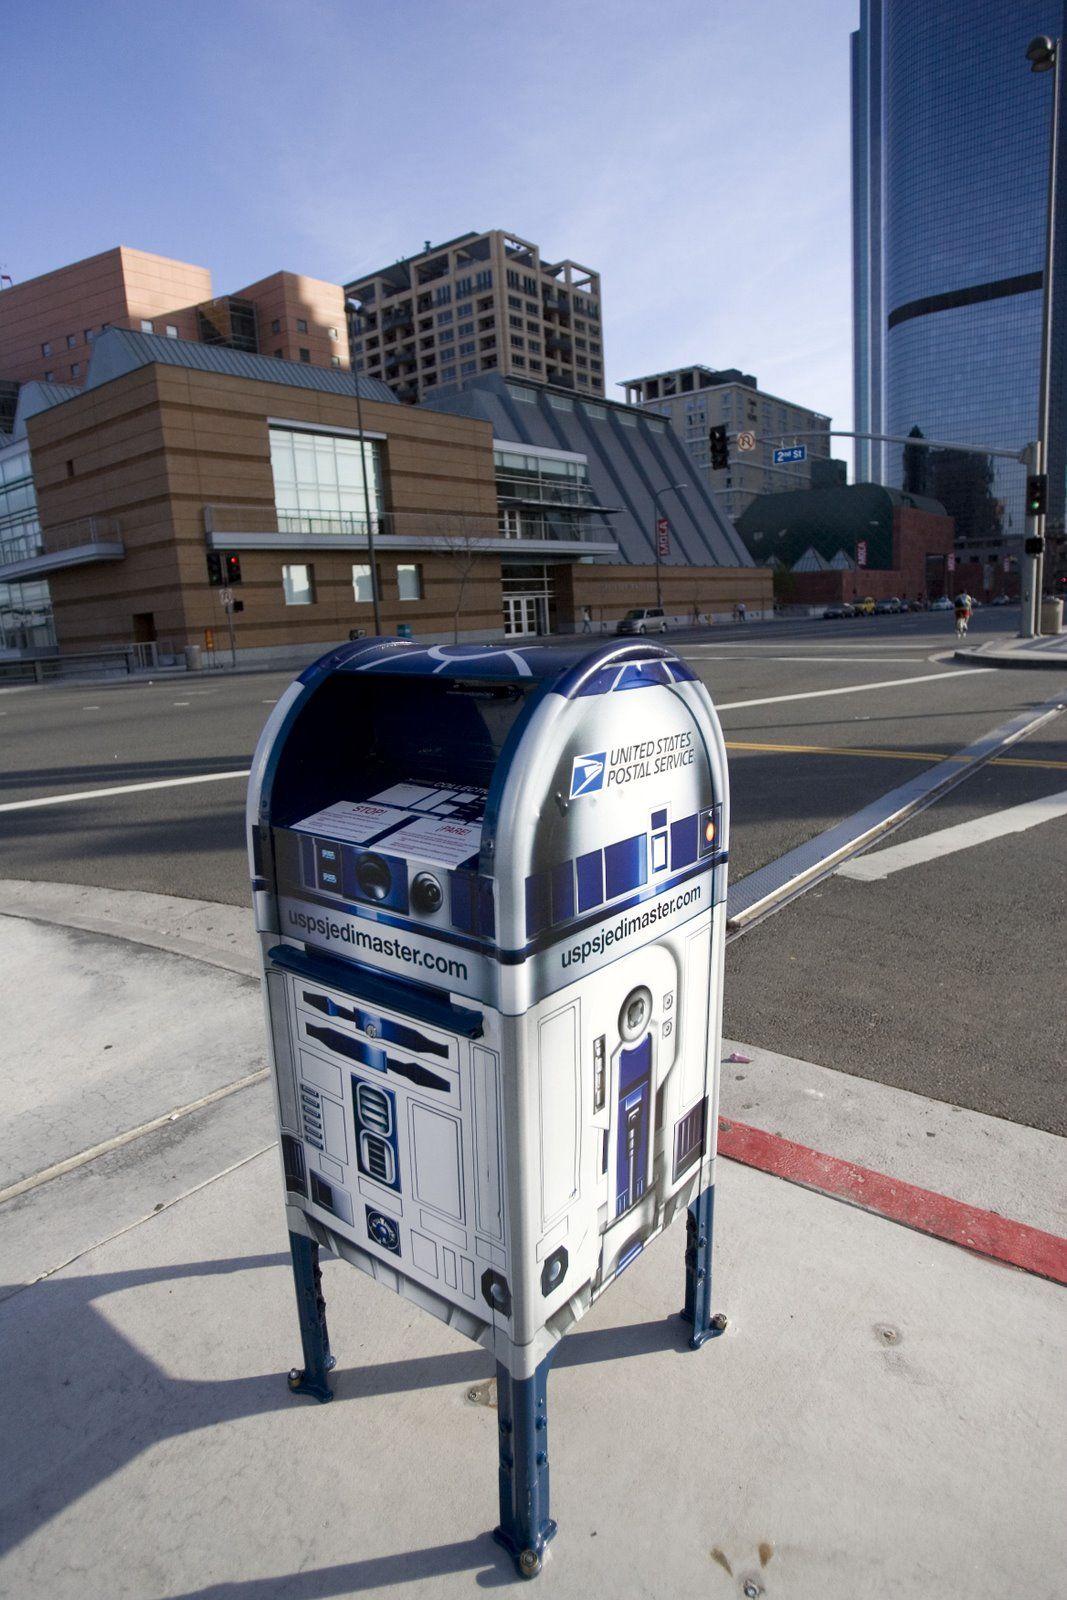 R2d2 mailbox urban pinterest for Correo postal mas cercano